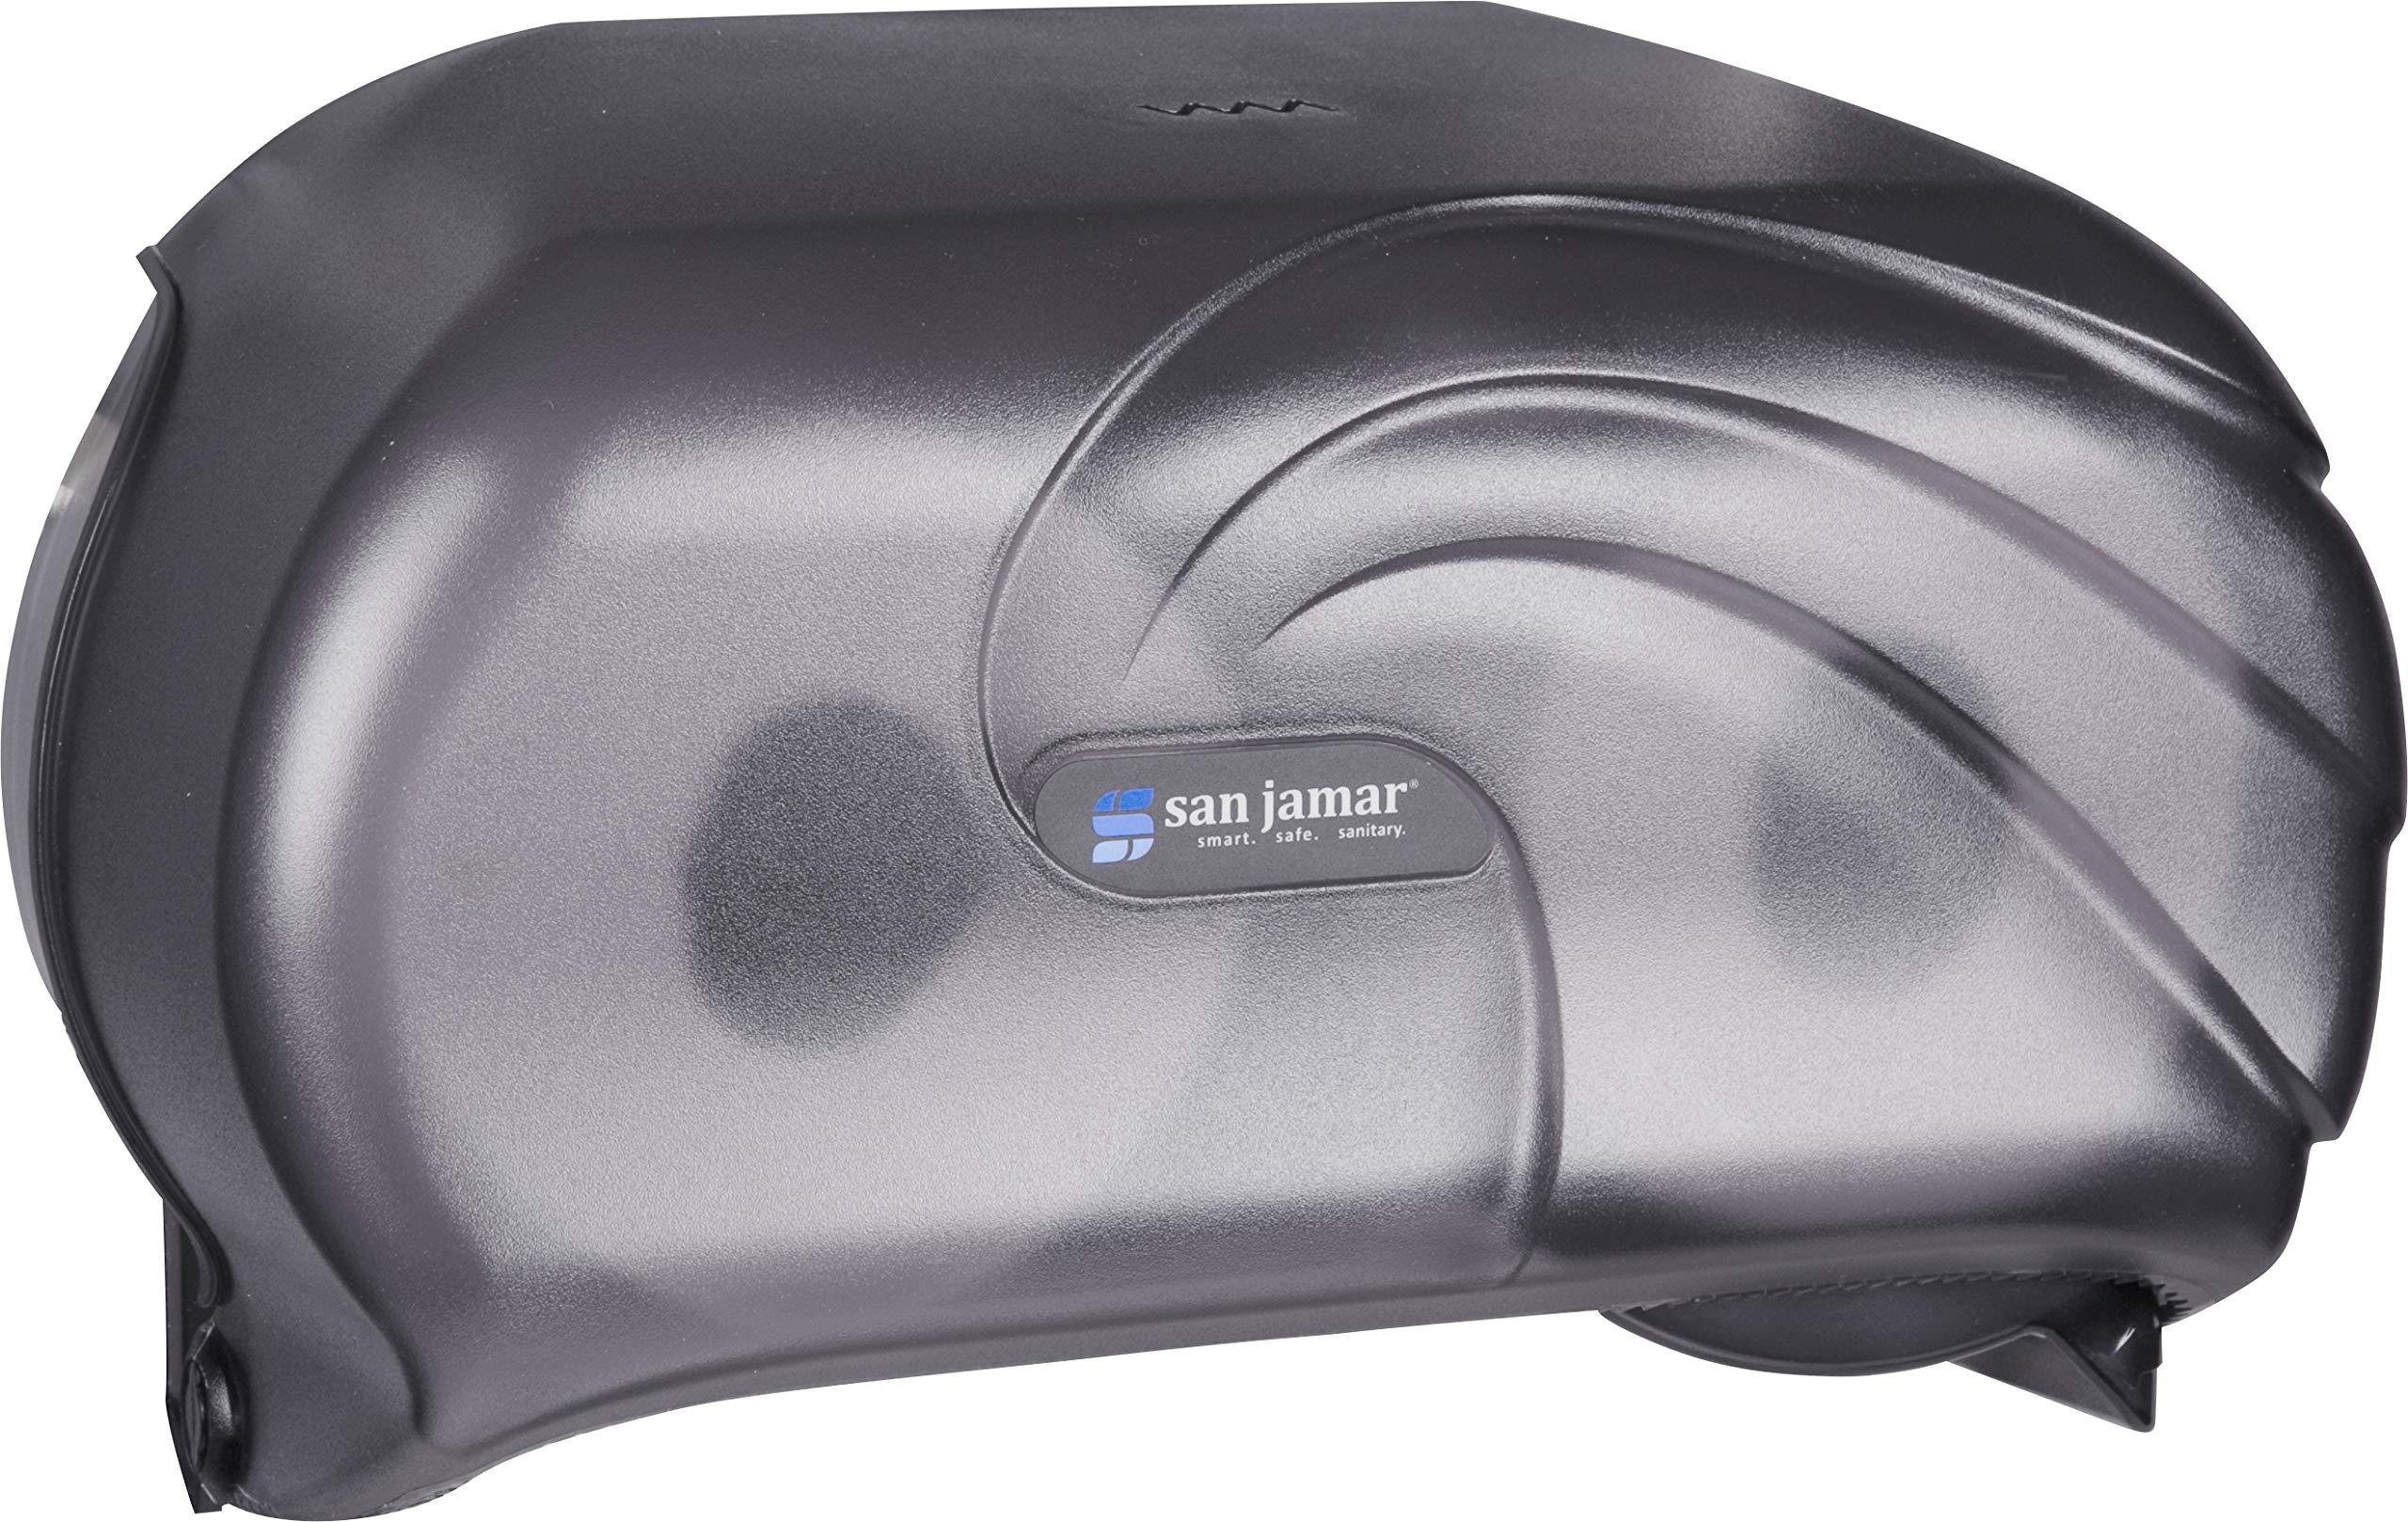 San Jamar R3690TBK Versatwin Double Roll Toilet Tissue Dispenser with Bio Pruf, Oceans, Black Pearl by San Jamar (Image #4)